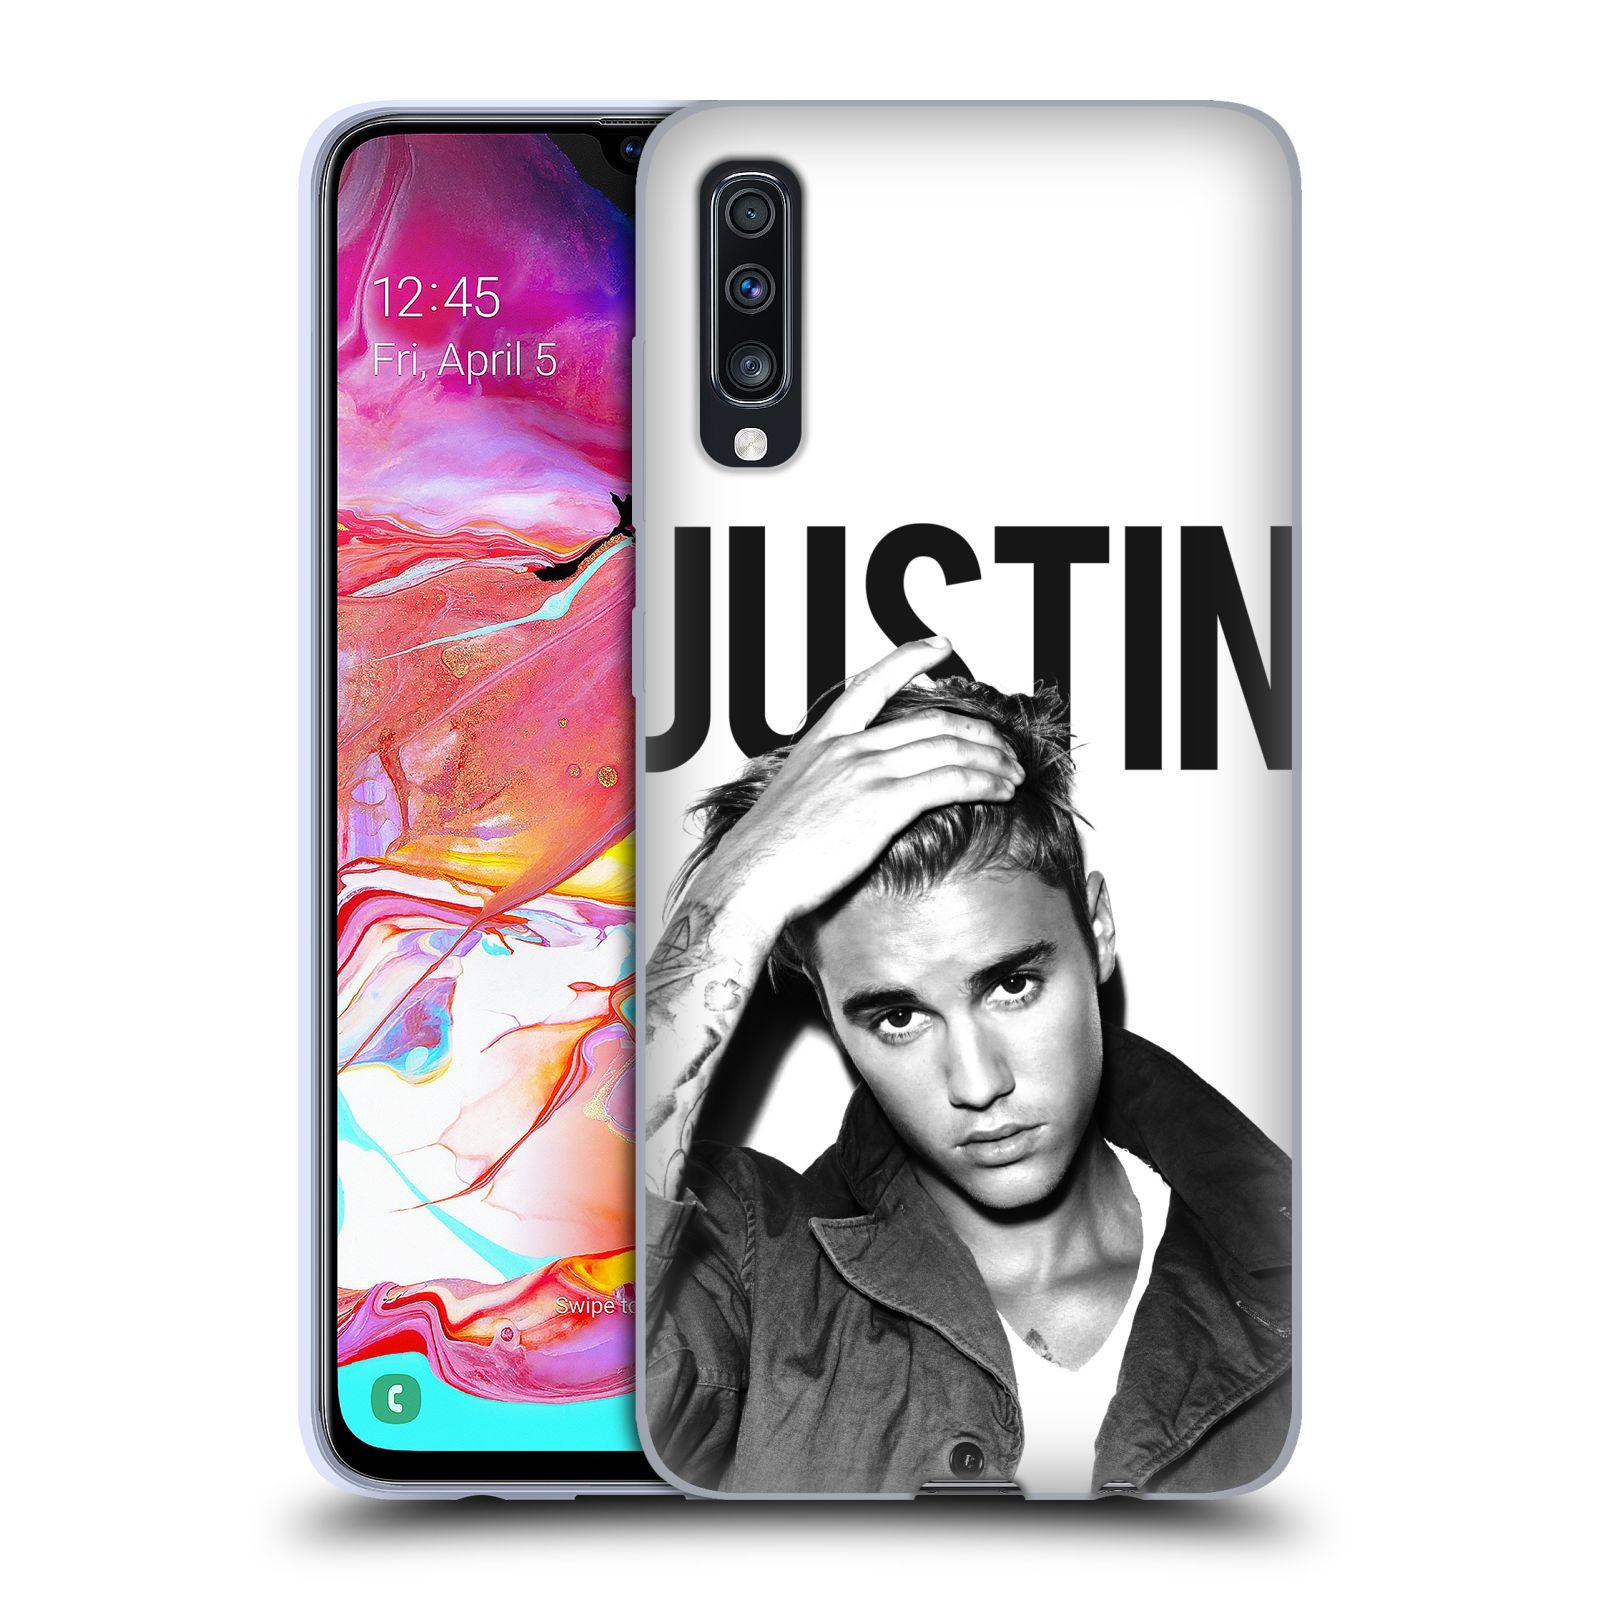 Silikonové pouzdro na mobil Samsung Galaxy A70 - Head Case - Justin Bieber Official - Póza